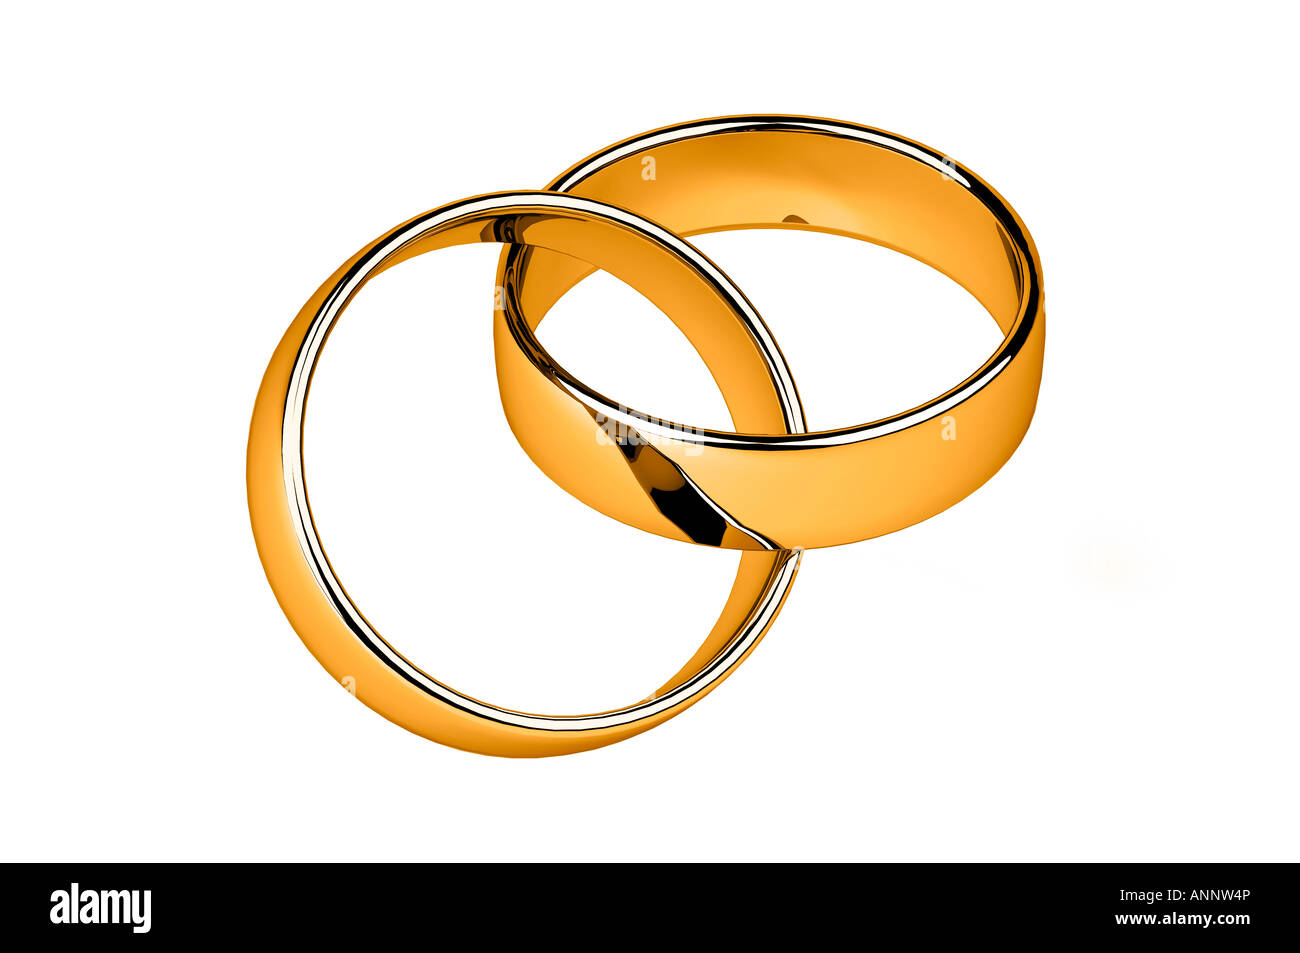 Interlocked gold wedding rings Stock Photo Royalty Free Image